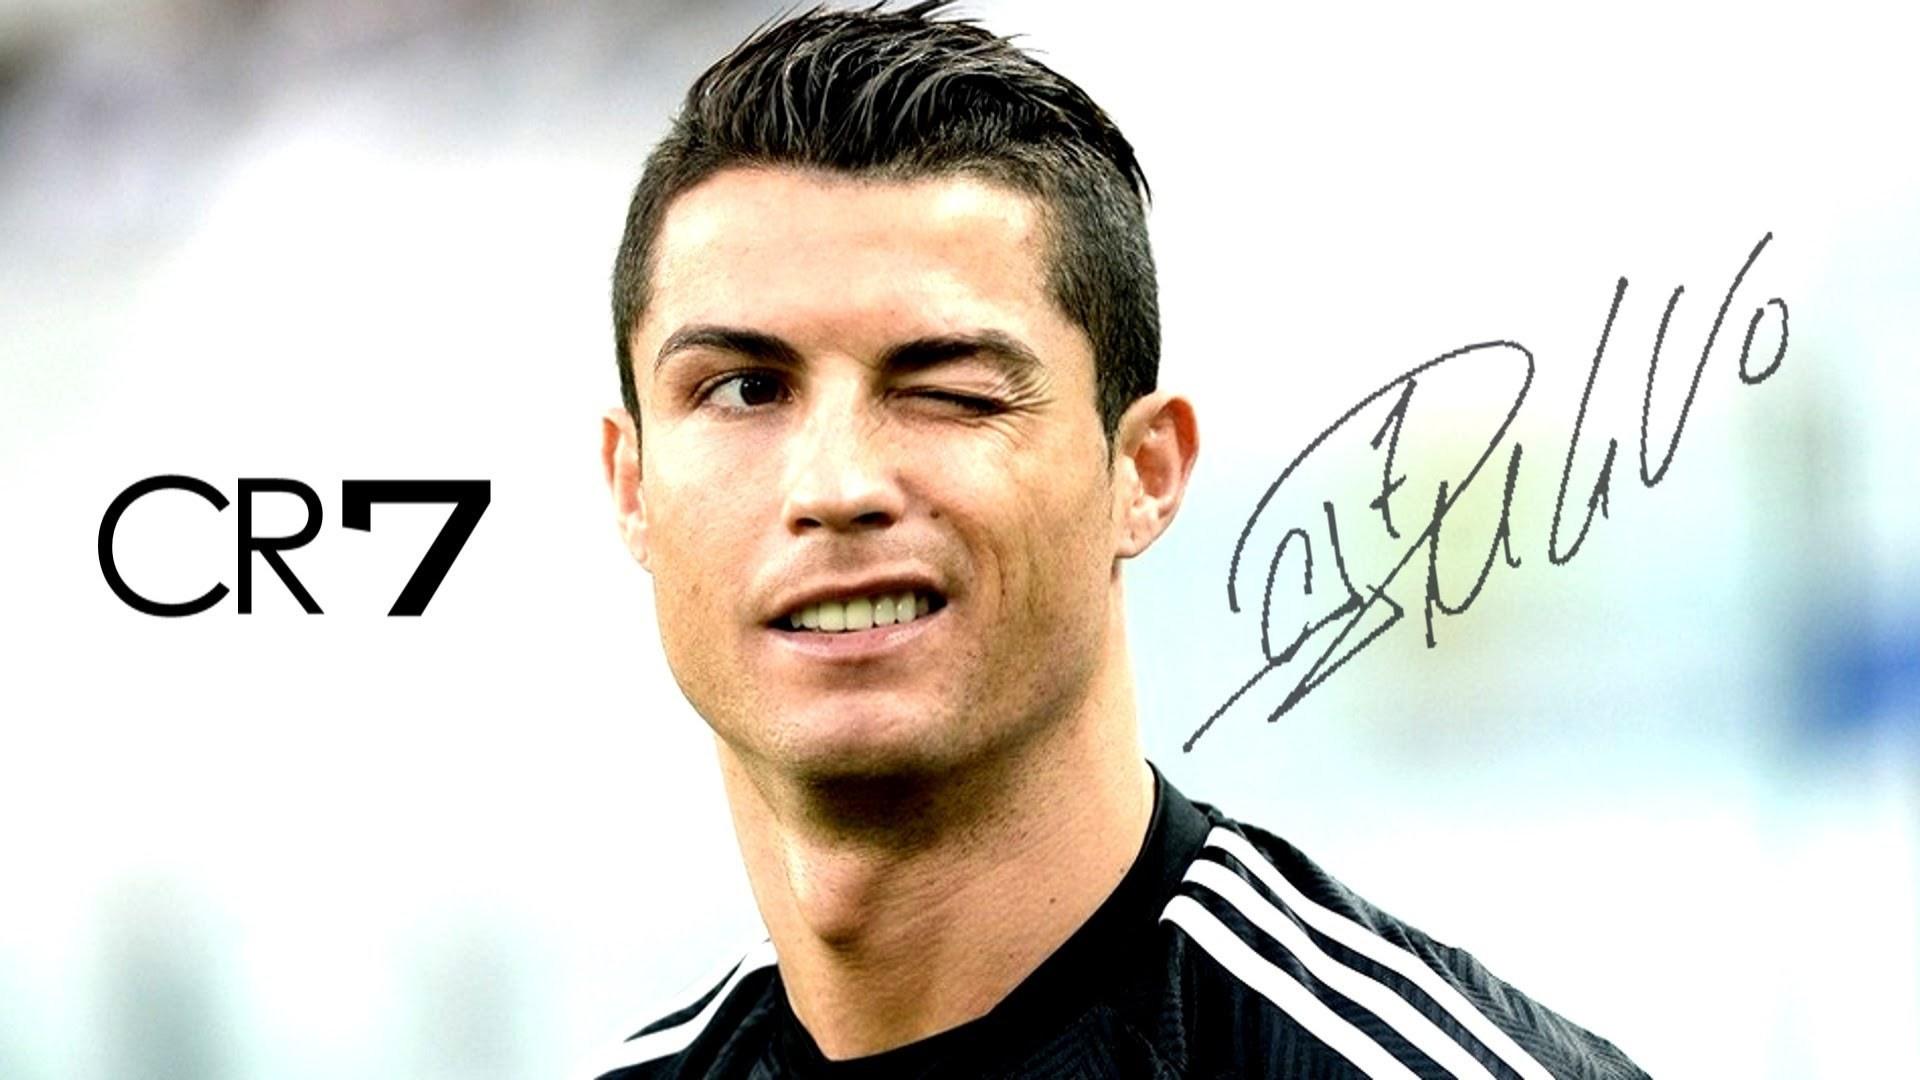 Cristiano Ronaldo Juventus Desktop Wallpaper 2020 Cute Wallpapers 1920x1080